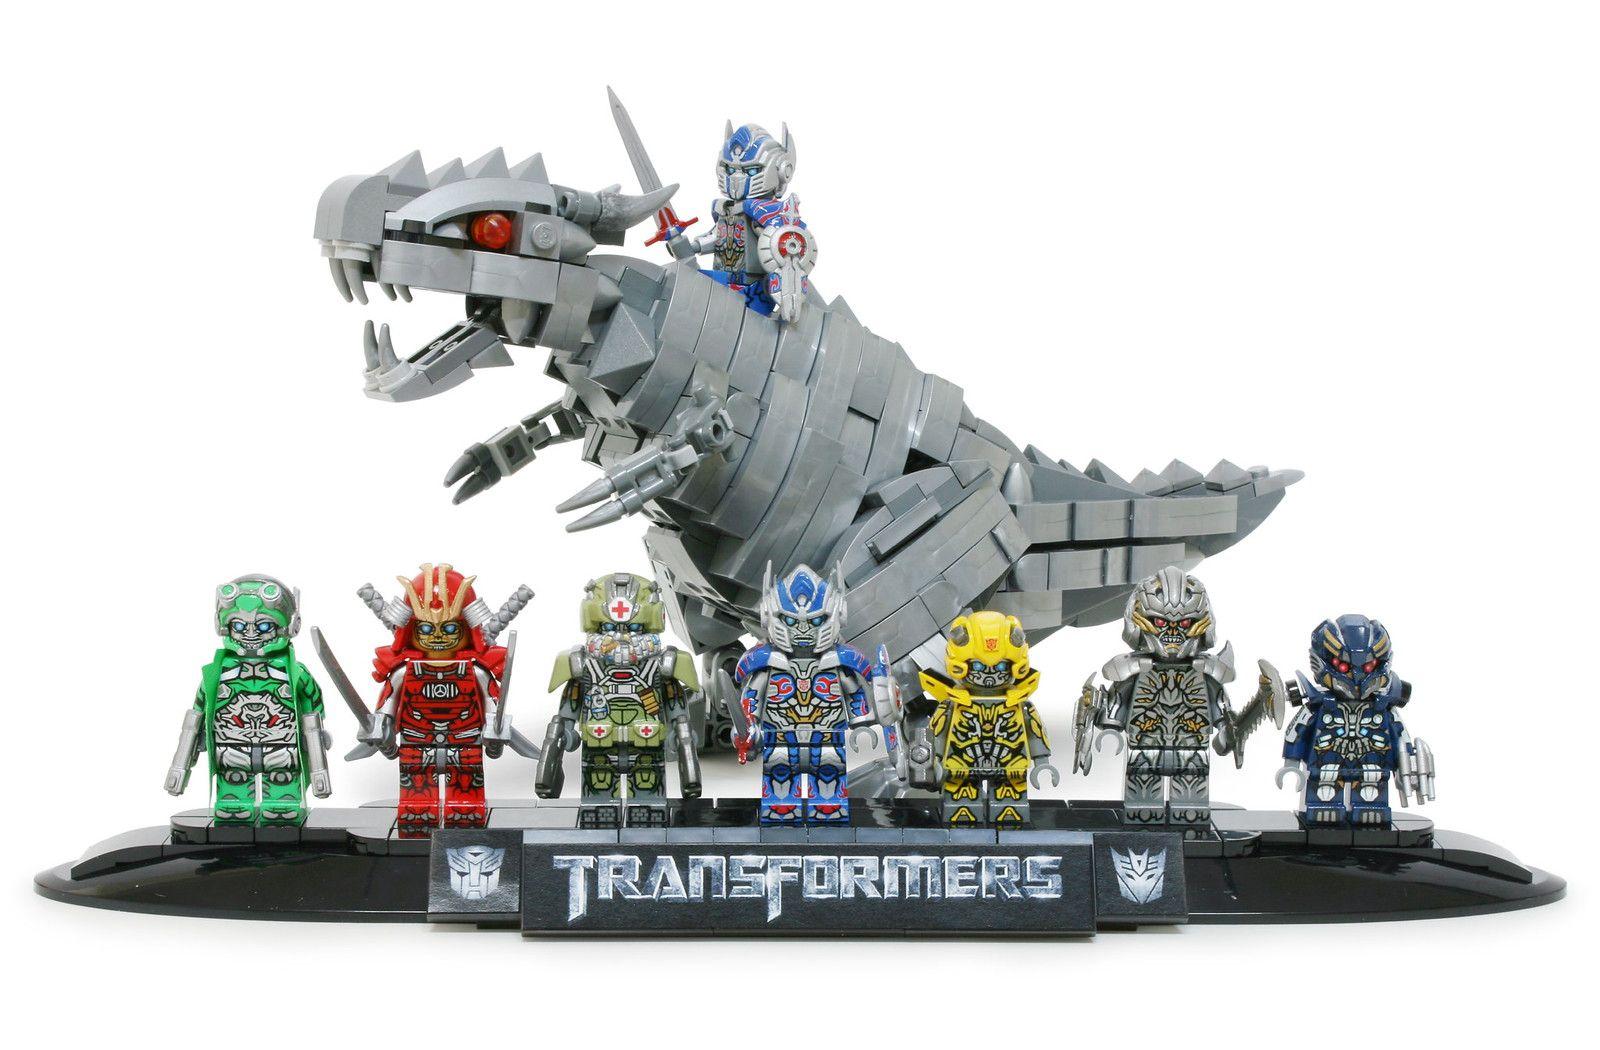 Lego The Movie Transformers Lego Transformers Lego Transformers